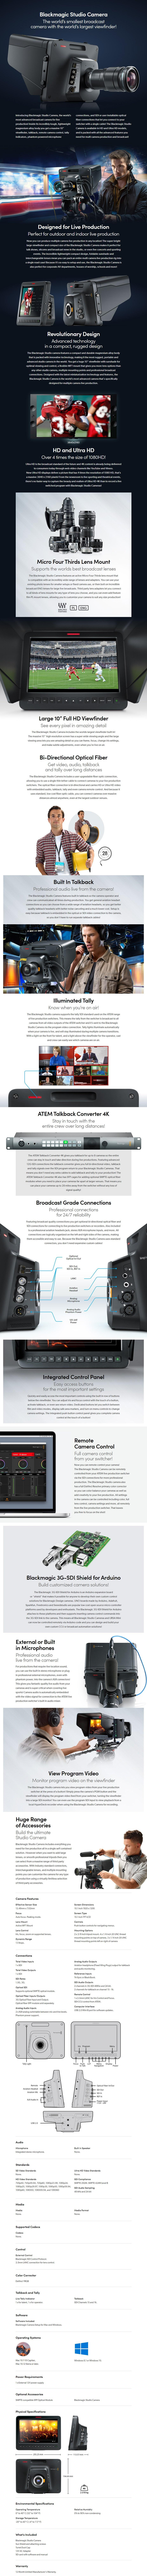 Blackmagic Design Studio Camera 2 - Overview 1